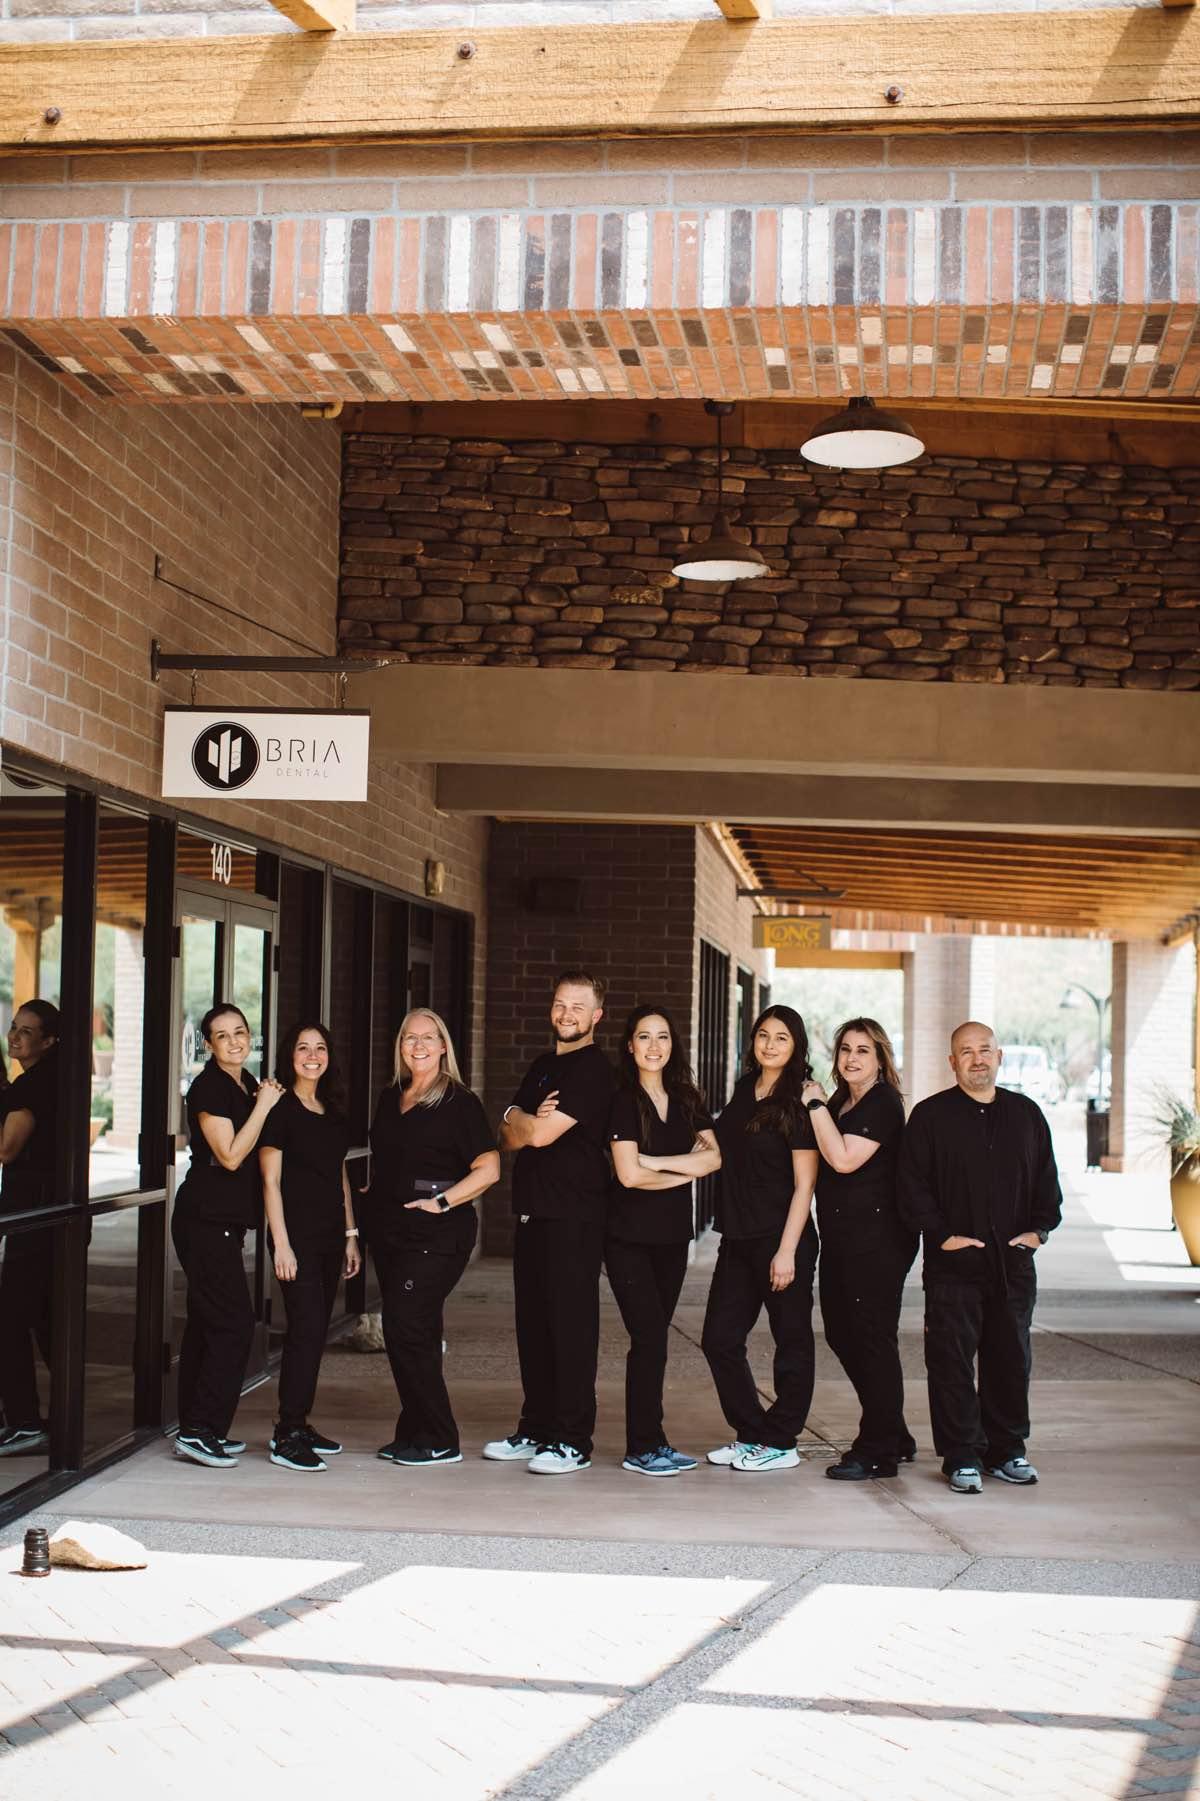 Photo of the Bria Dental team